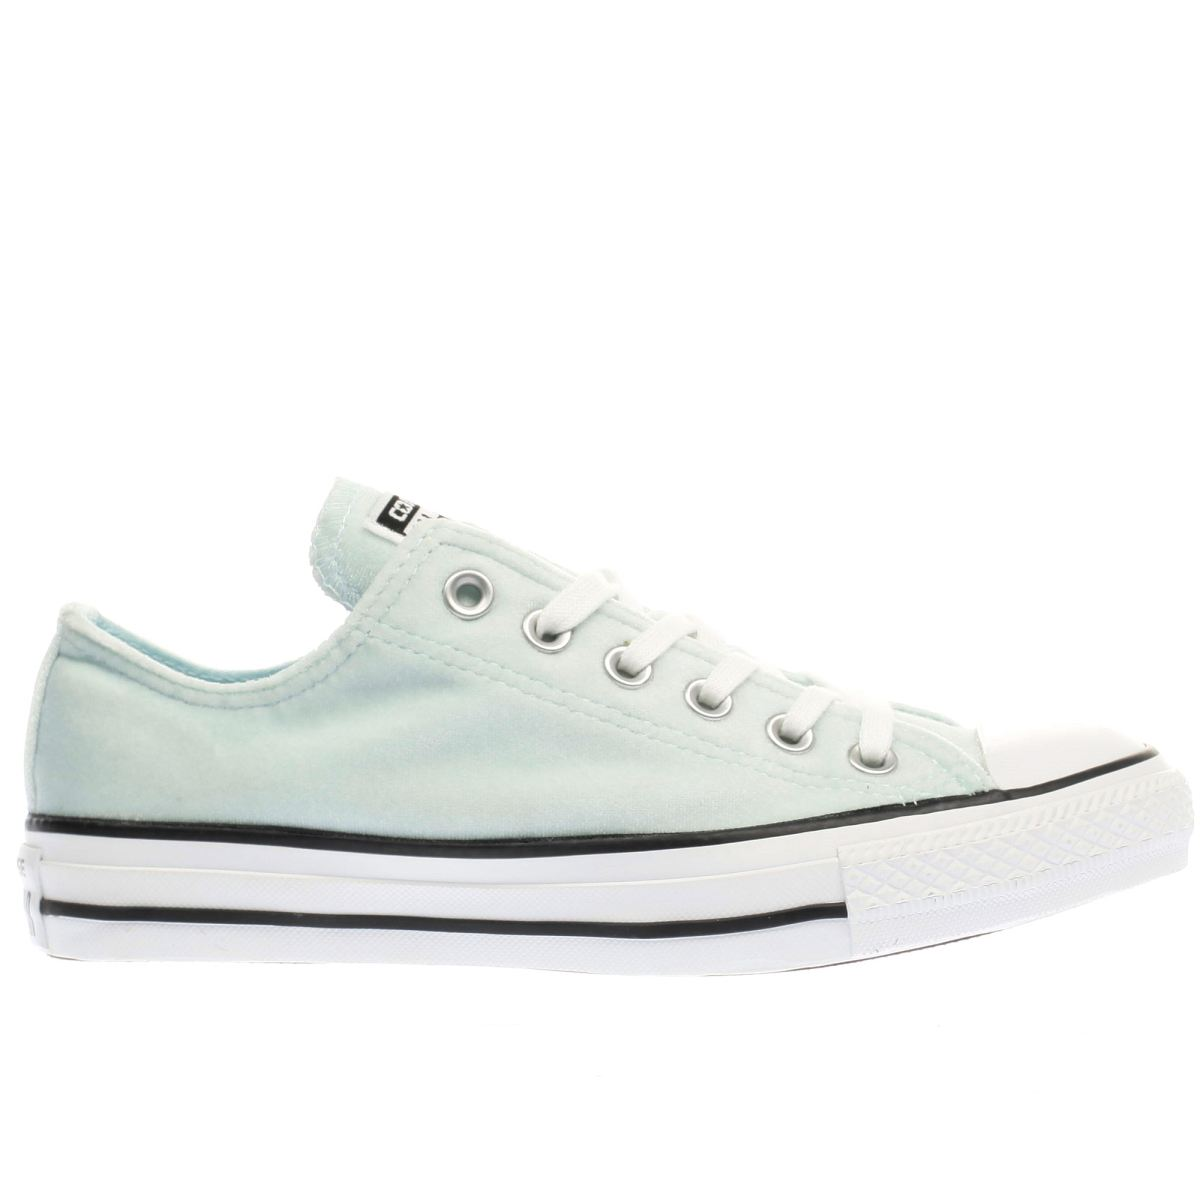 converse light green all star velvet ox trainers